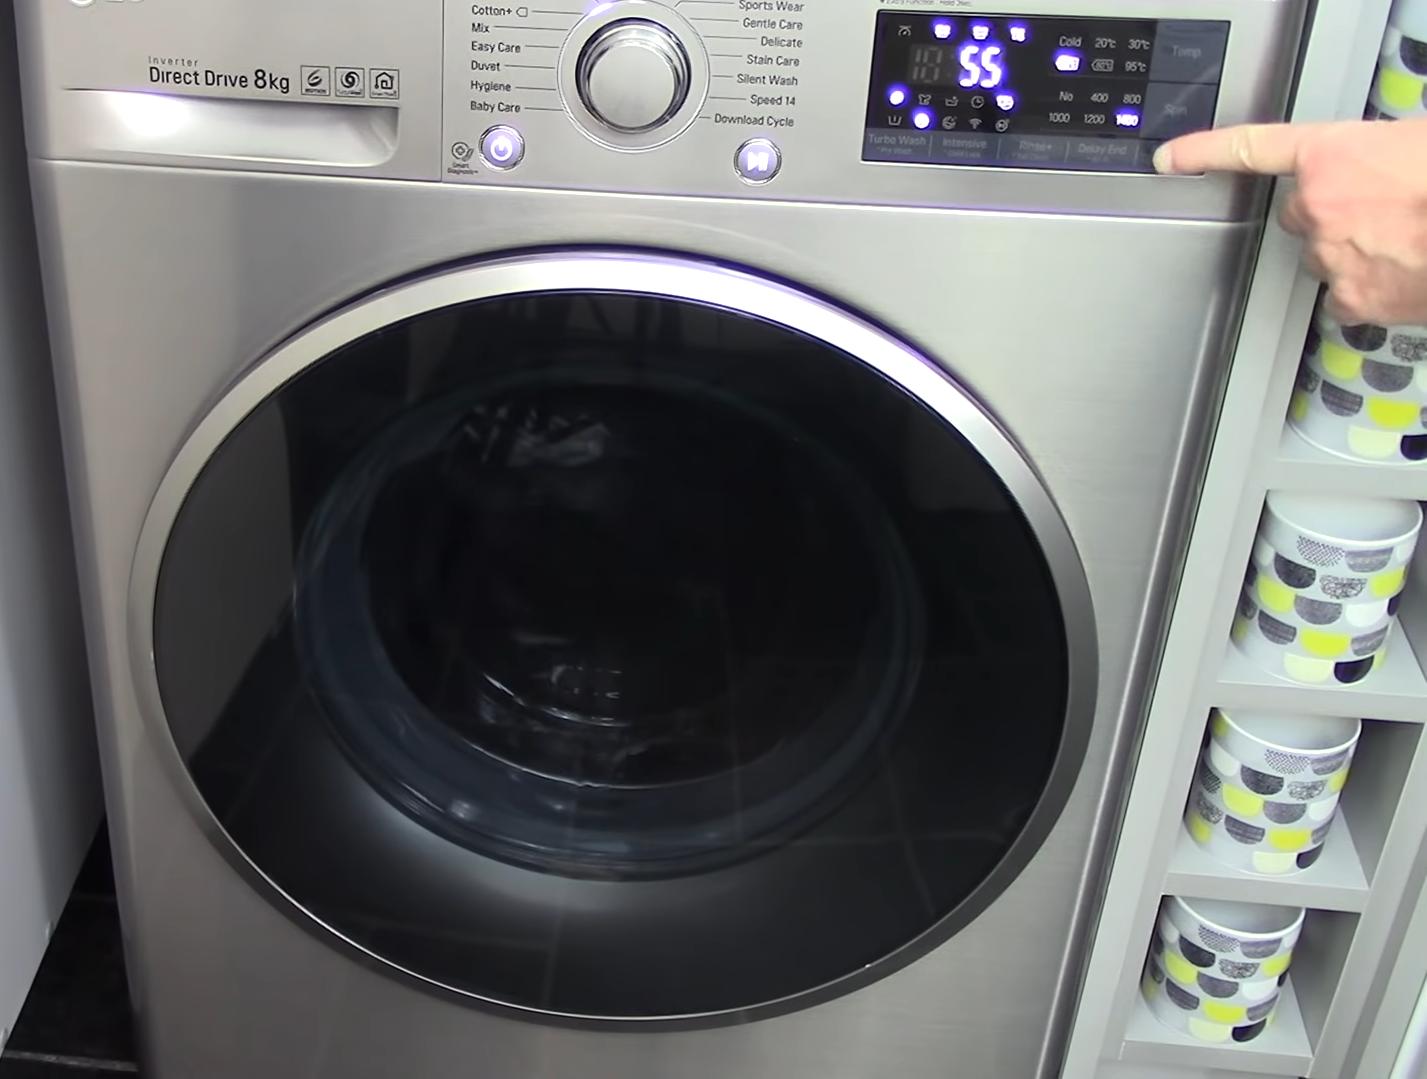 Sewer Smell From Washing Machine Wooden Washing Machine Lg Washing Machine Not Draining Washin In 2020 Washing Machine Washing Machine Reviews Bosch Washing Machine